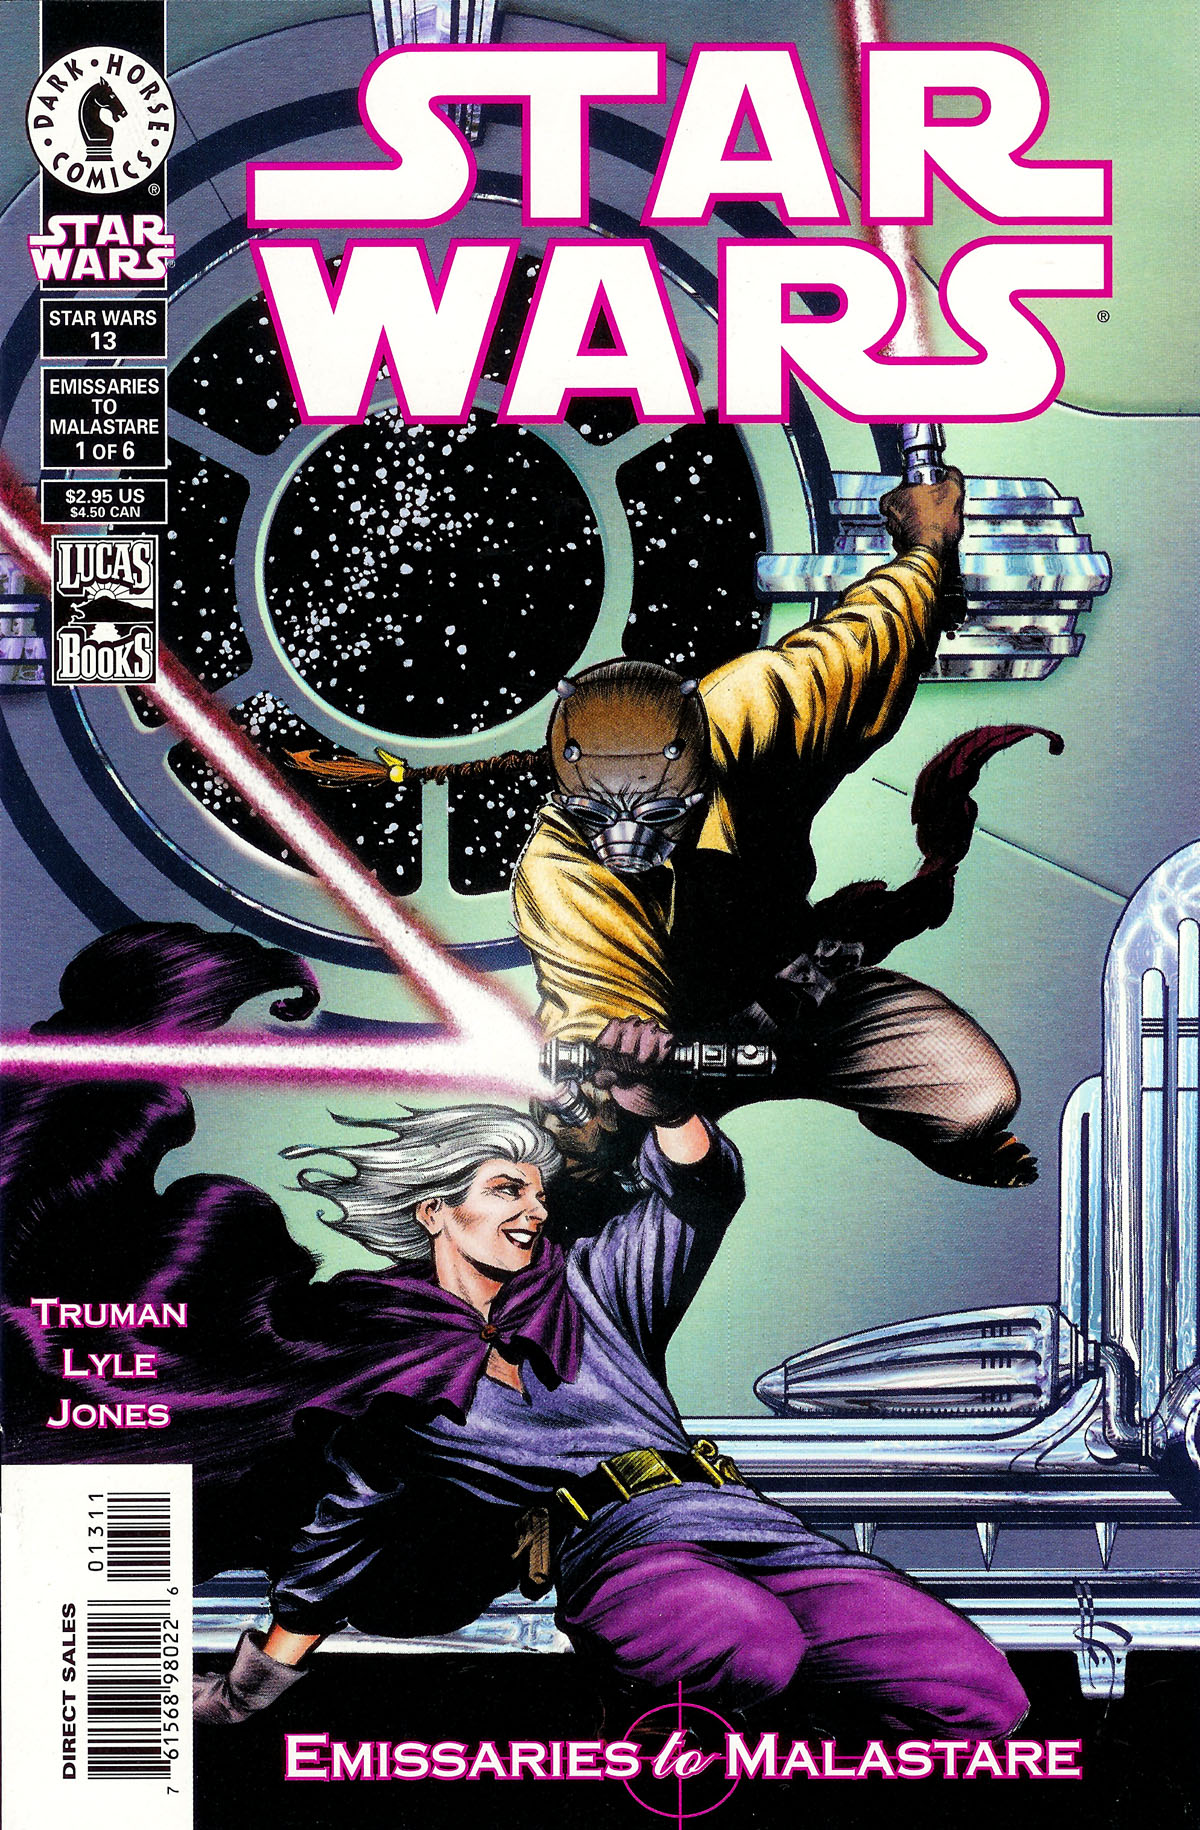 star wars republic 13 emissaries to malastare part 1 wookieepedia the star wars wiki. Black Bedroom Furniture Sets. Home Design Ideas